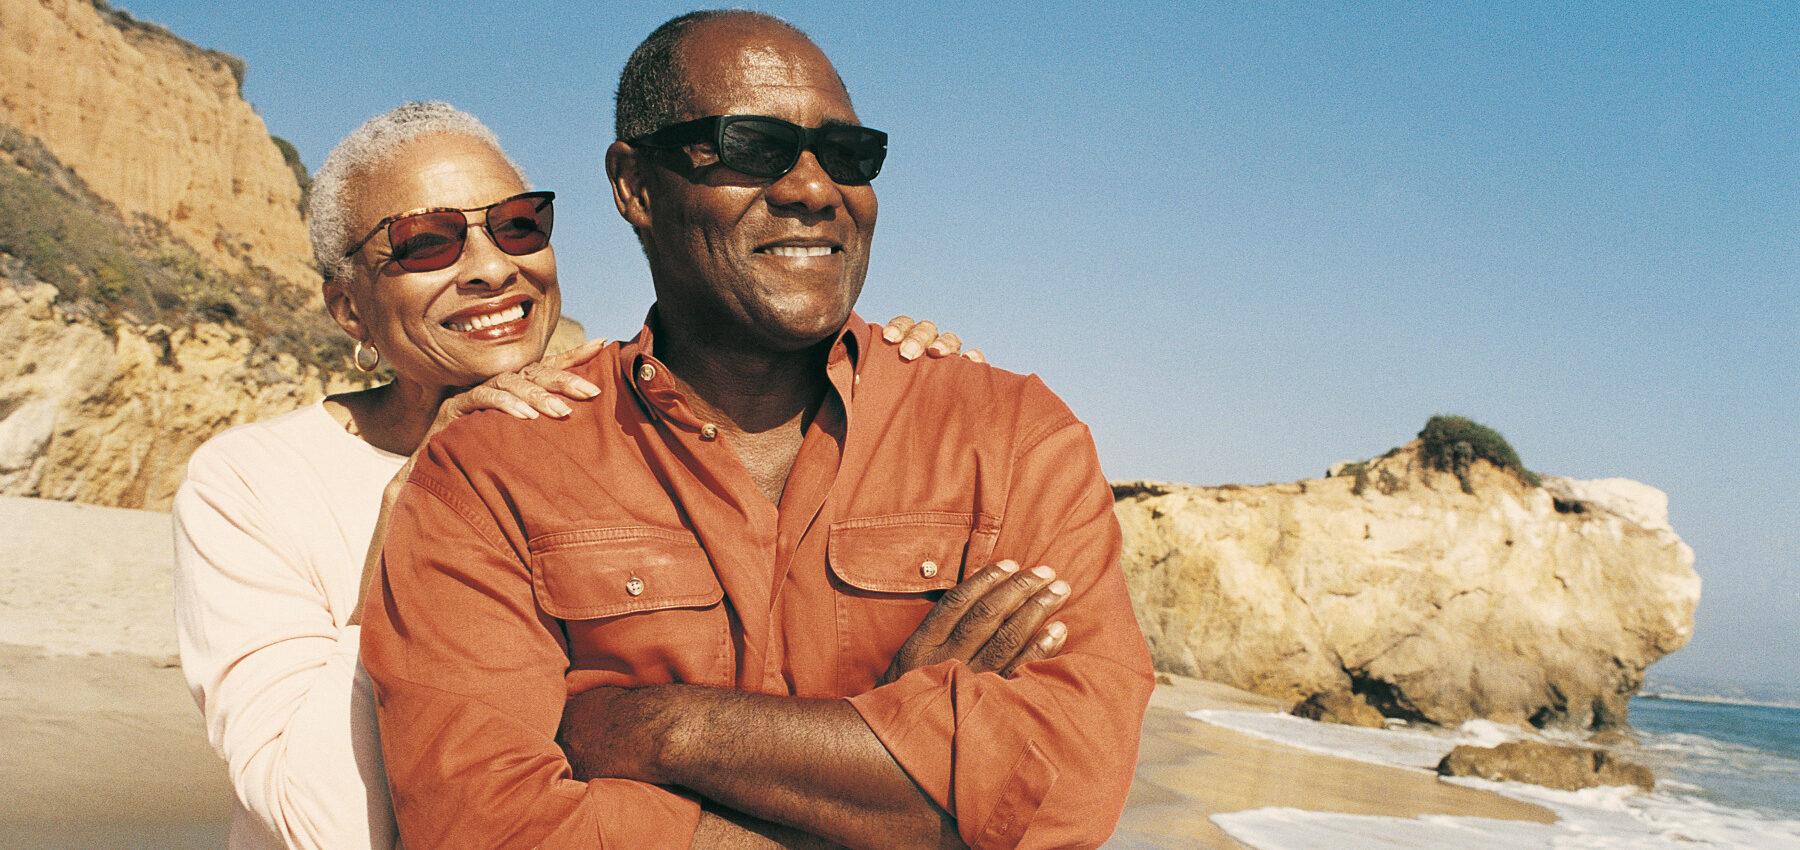 Man & Woman enjoying free time at the beach.